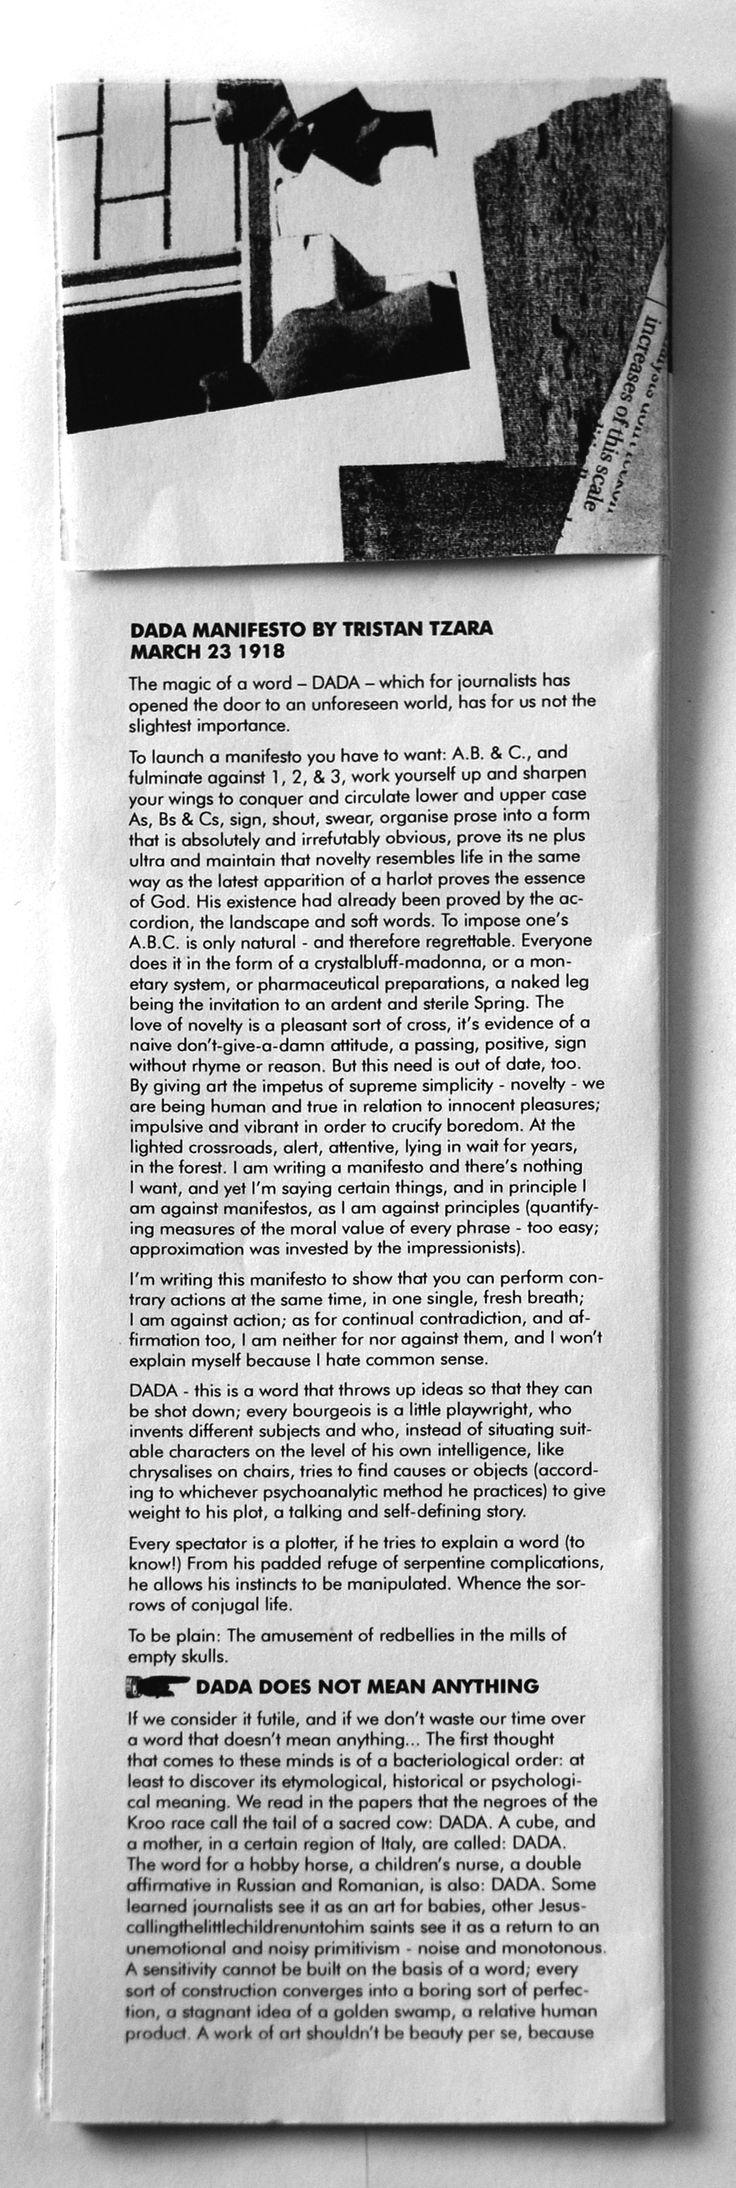 Dada Manifesto - Caitlin O'Neill.